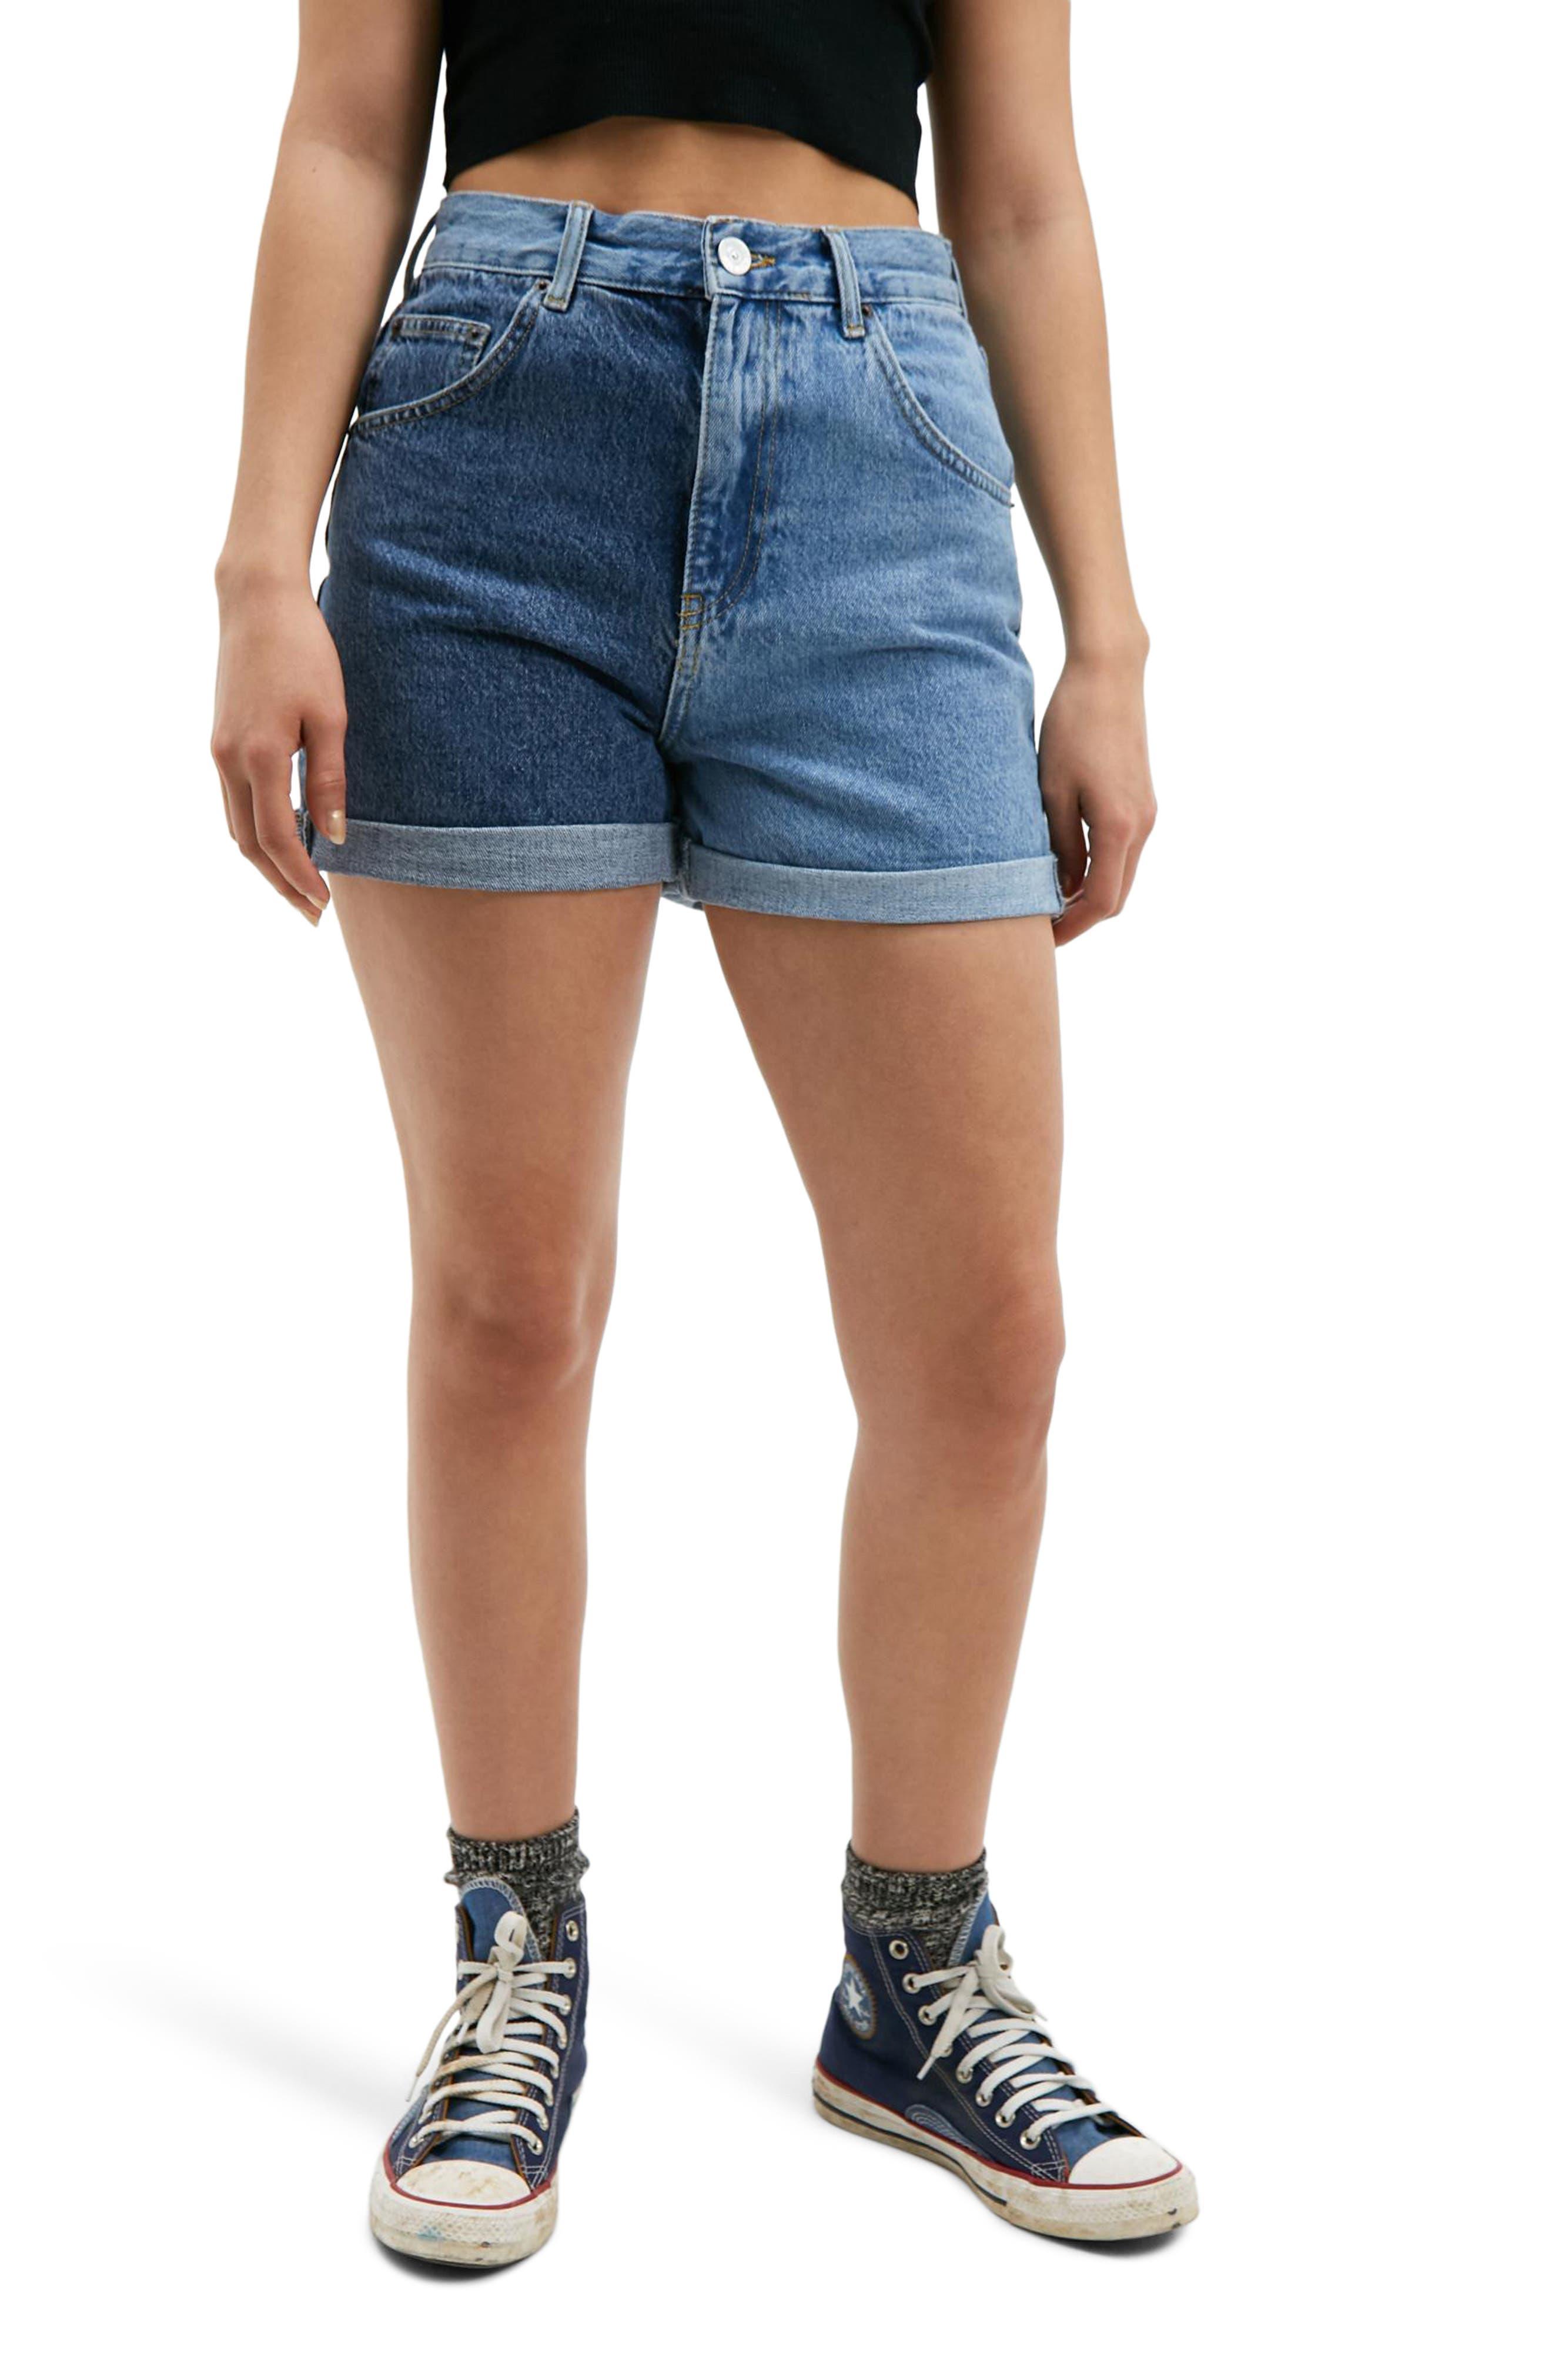 Two-Tone High Waist Roll Cuff Denim Shorts